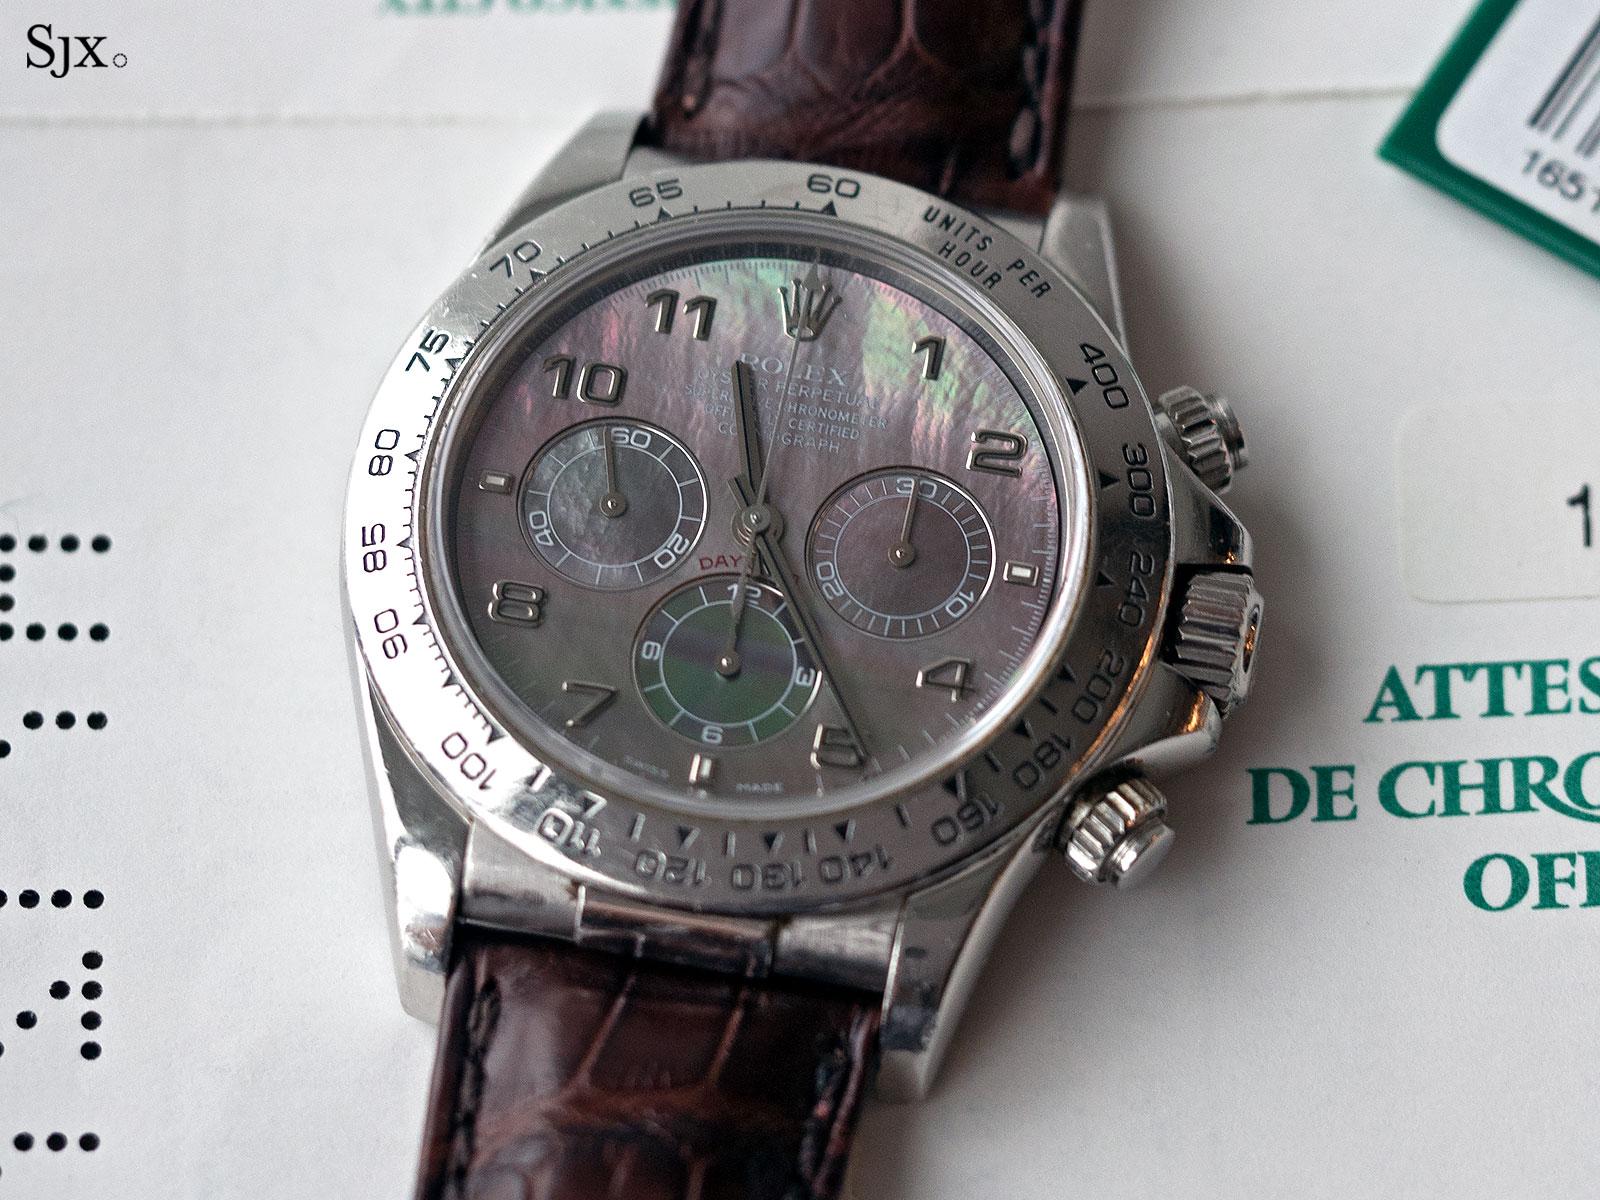 Rolex Daytona Zenith platinum 16516 5